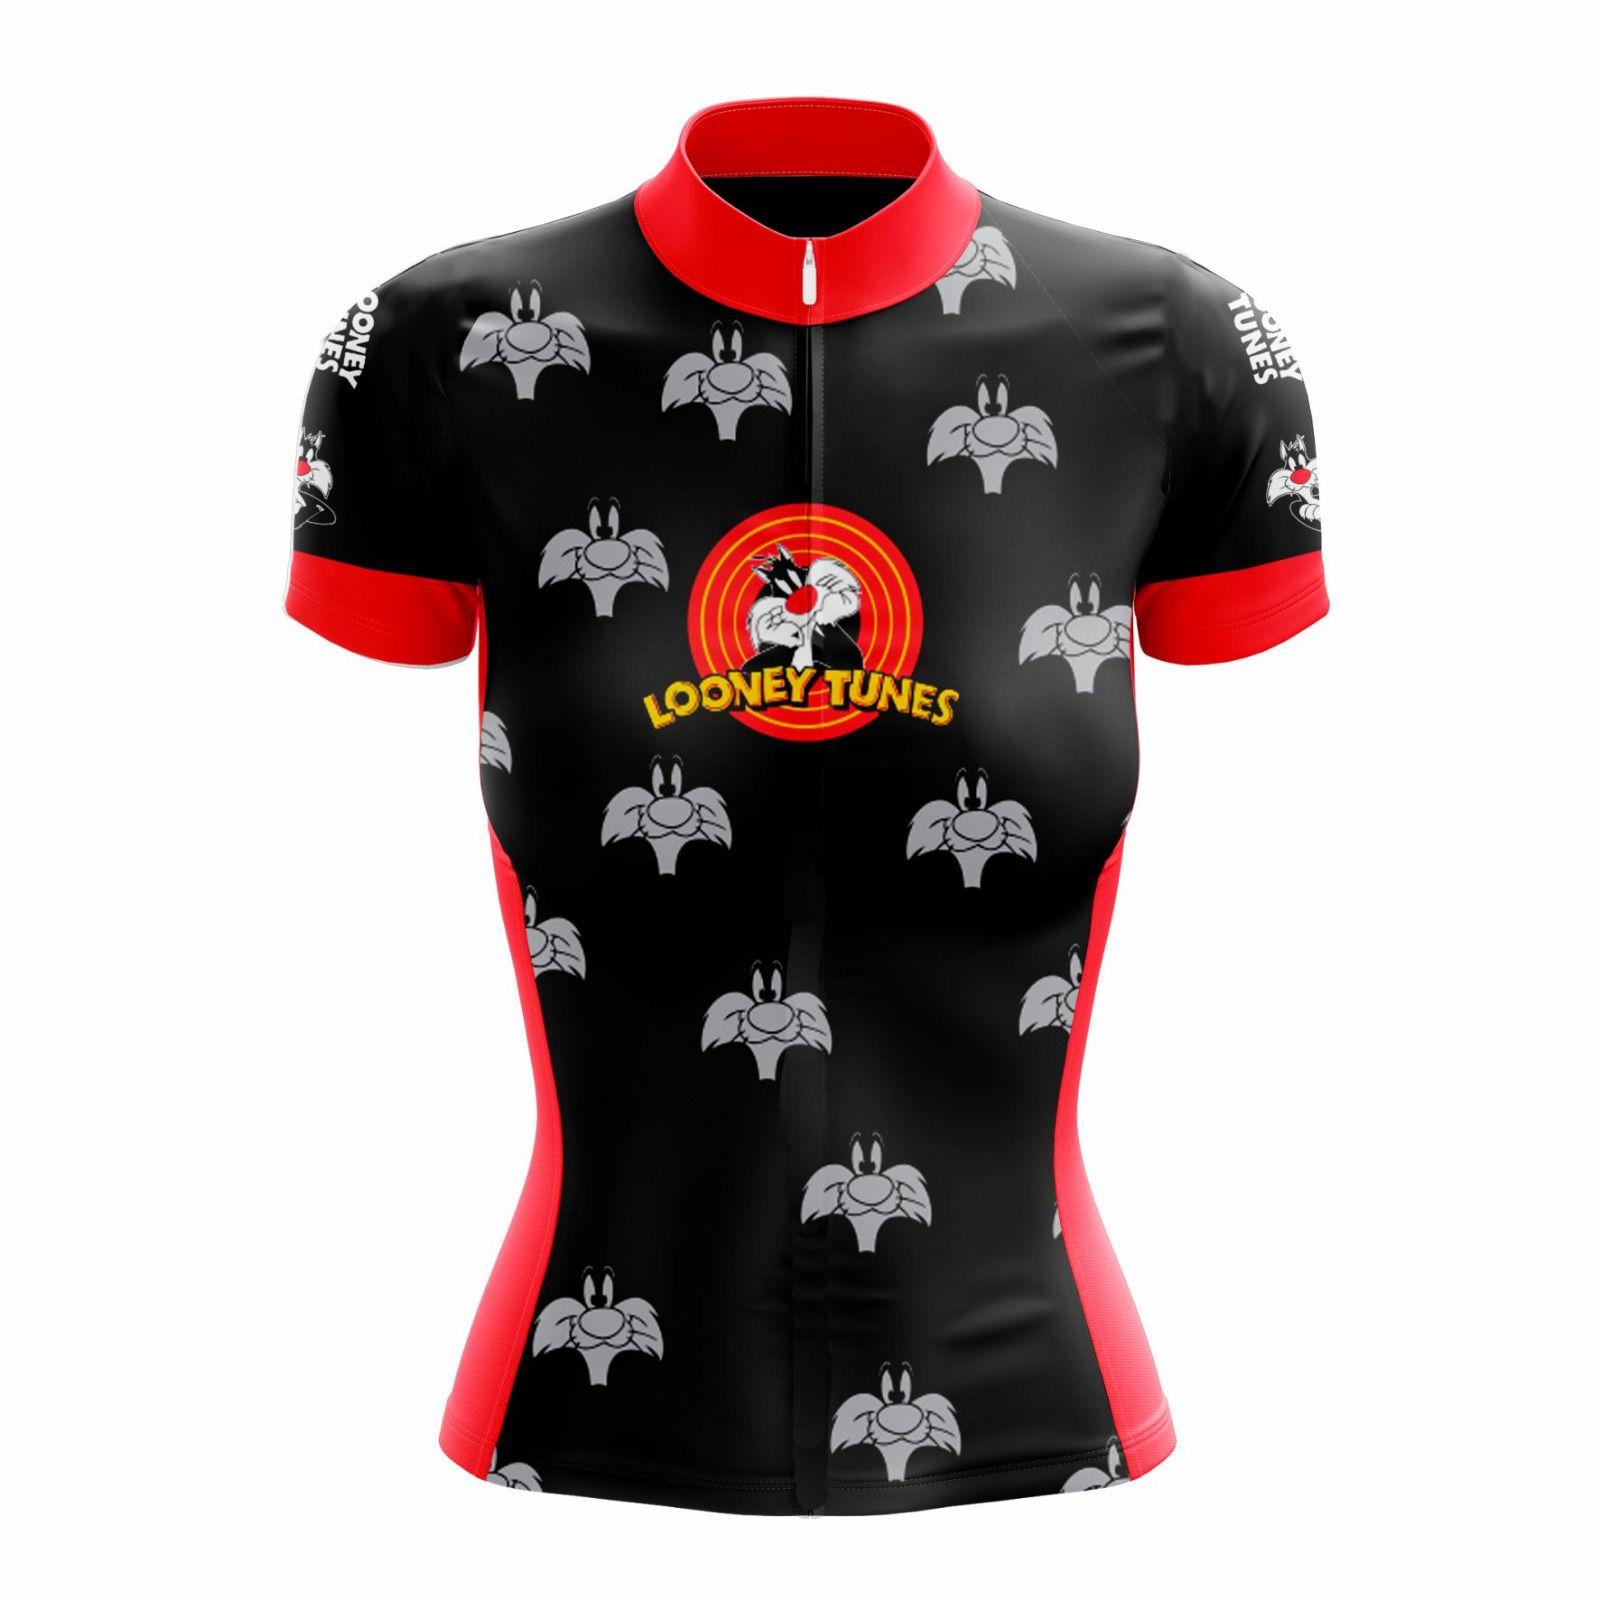 Camisa Ciclismo Feminina Looney Tunes Frajola - Scape